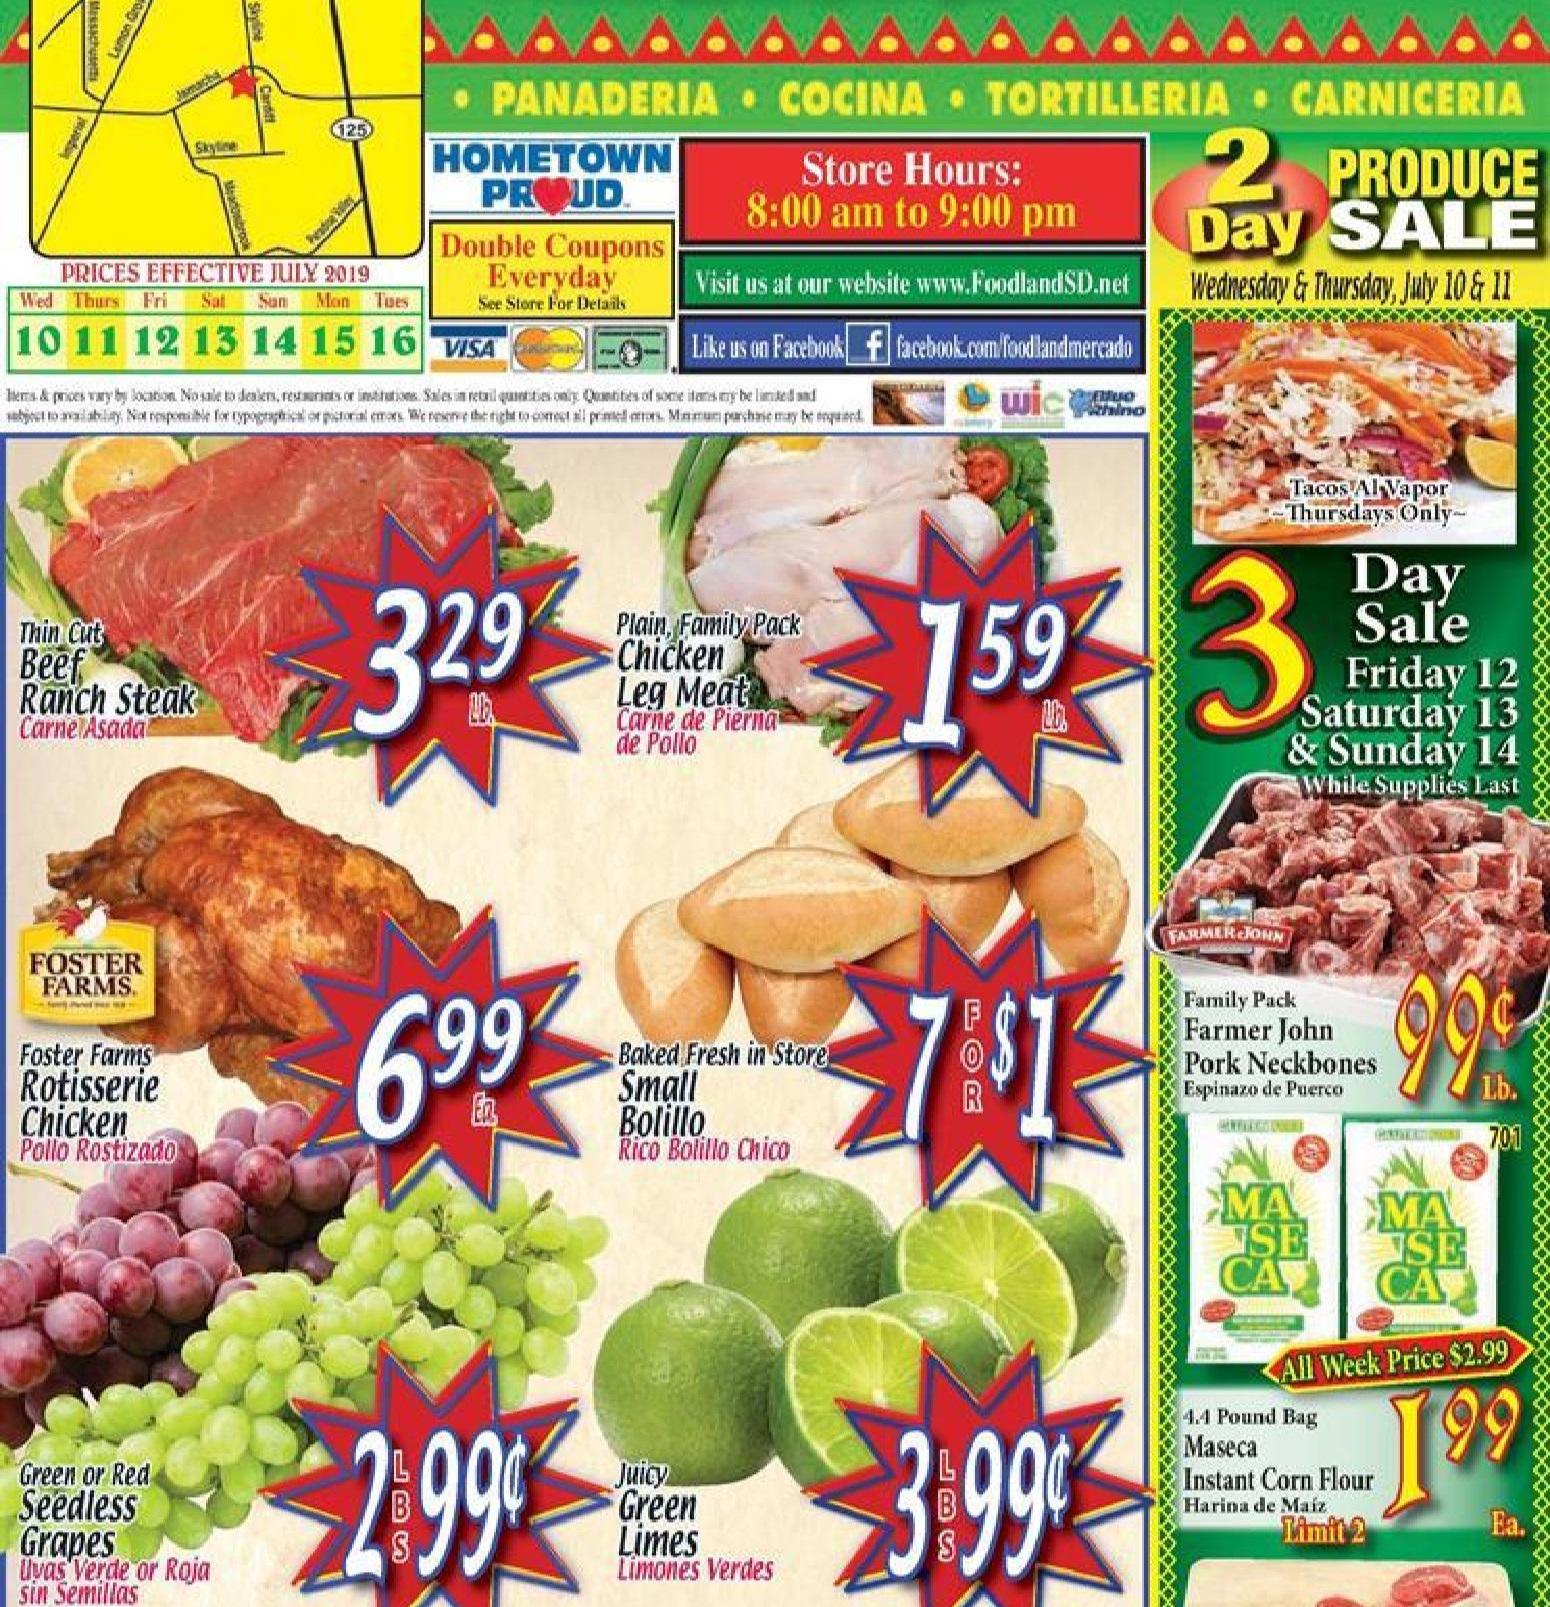 Foodland_071019_FINAL-page-001.jpg